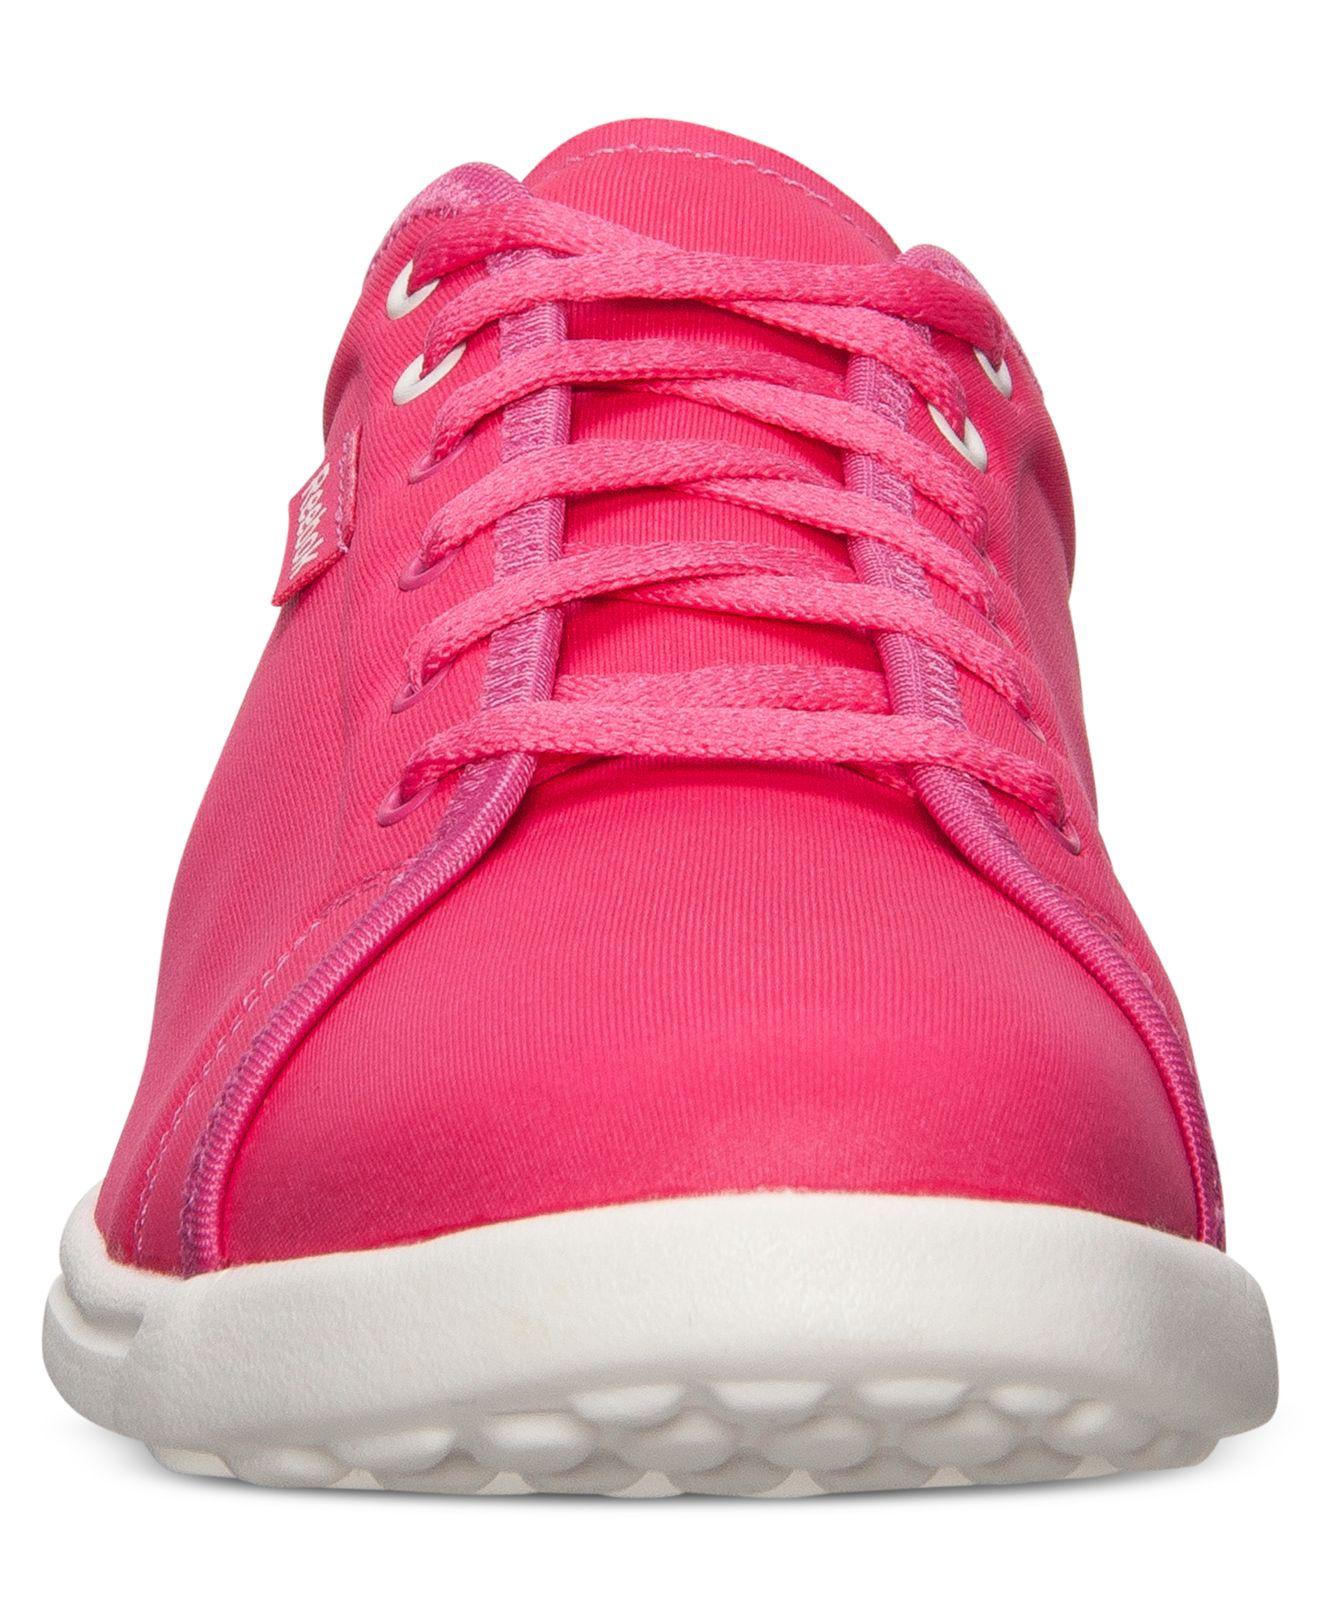 511706f38 Reebok Women's Skyscape Runaround Walking Sneakers From Finish Line ...